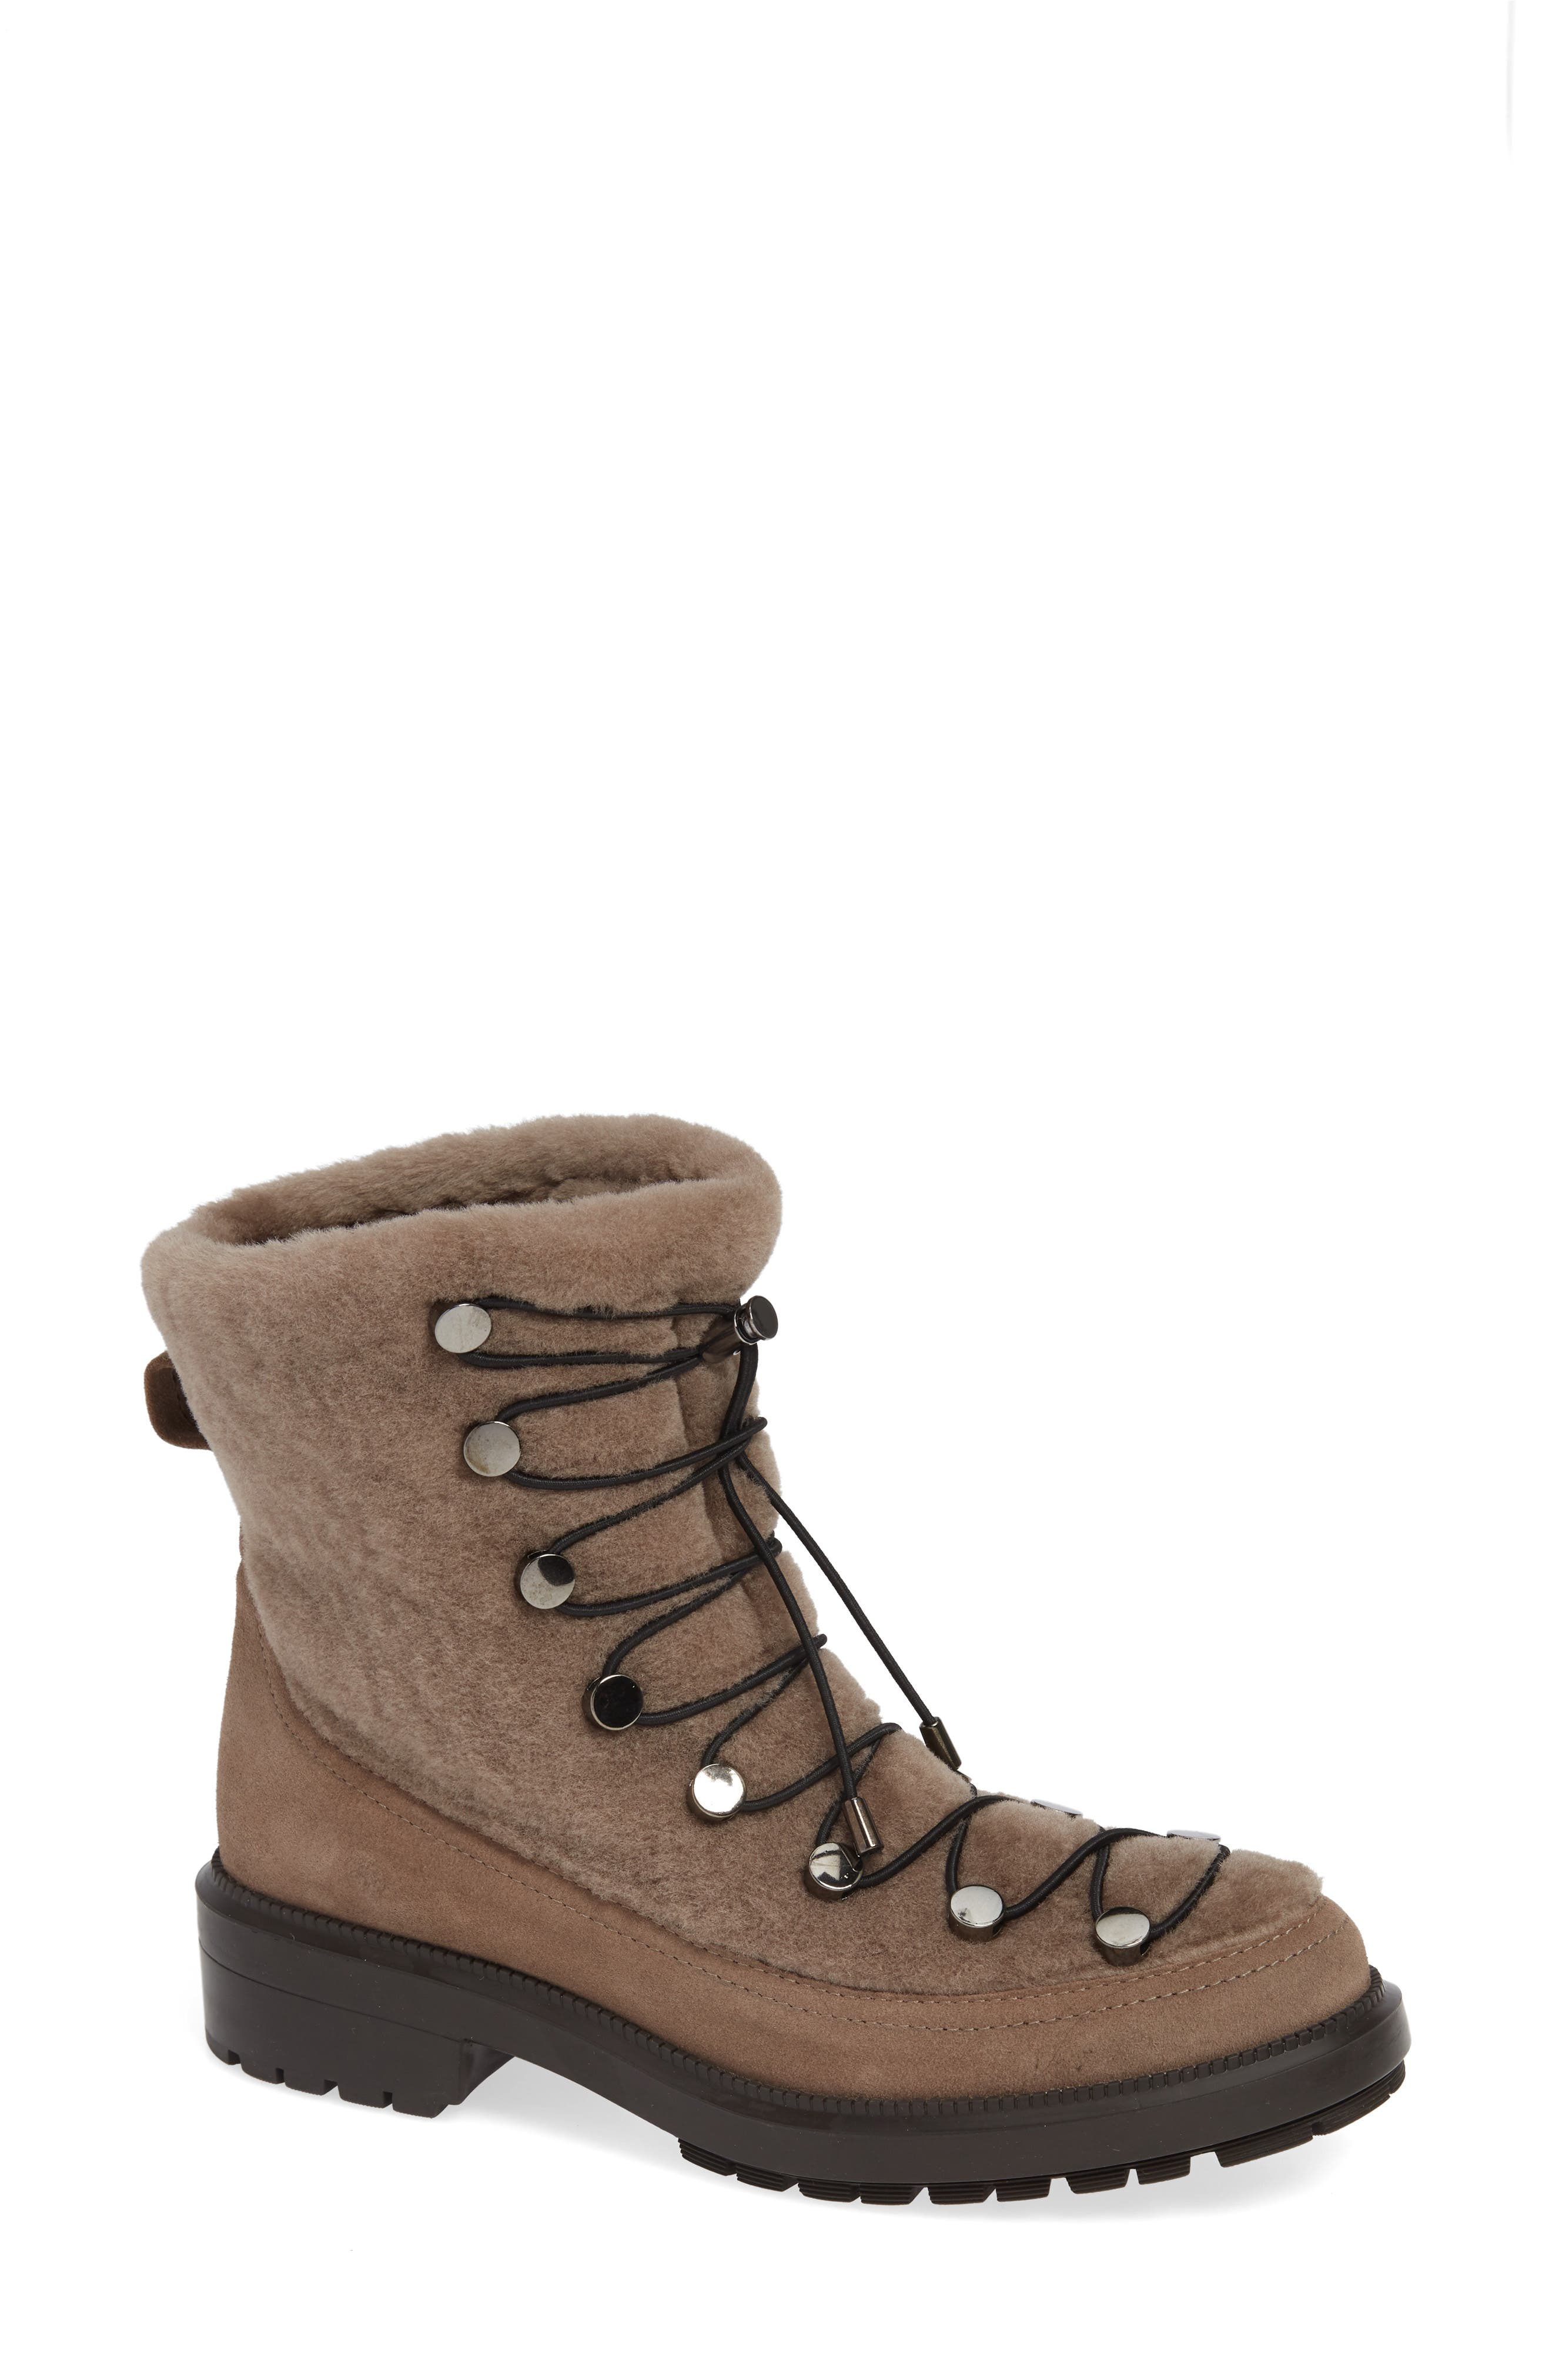 Aquatalia Lorena Genuine Shearling Boot, Beige